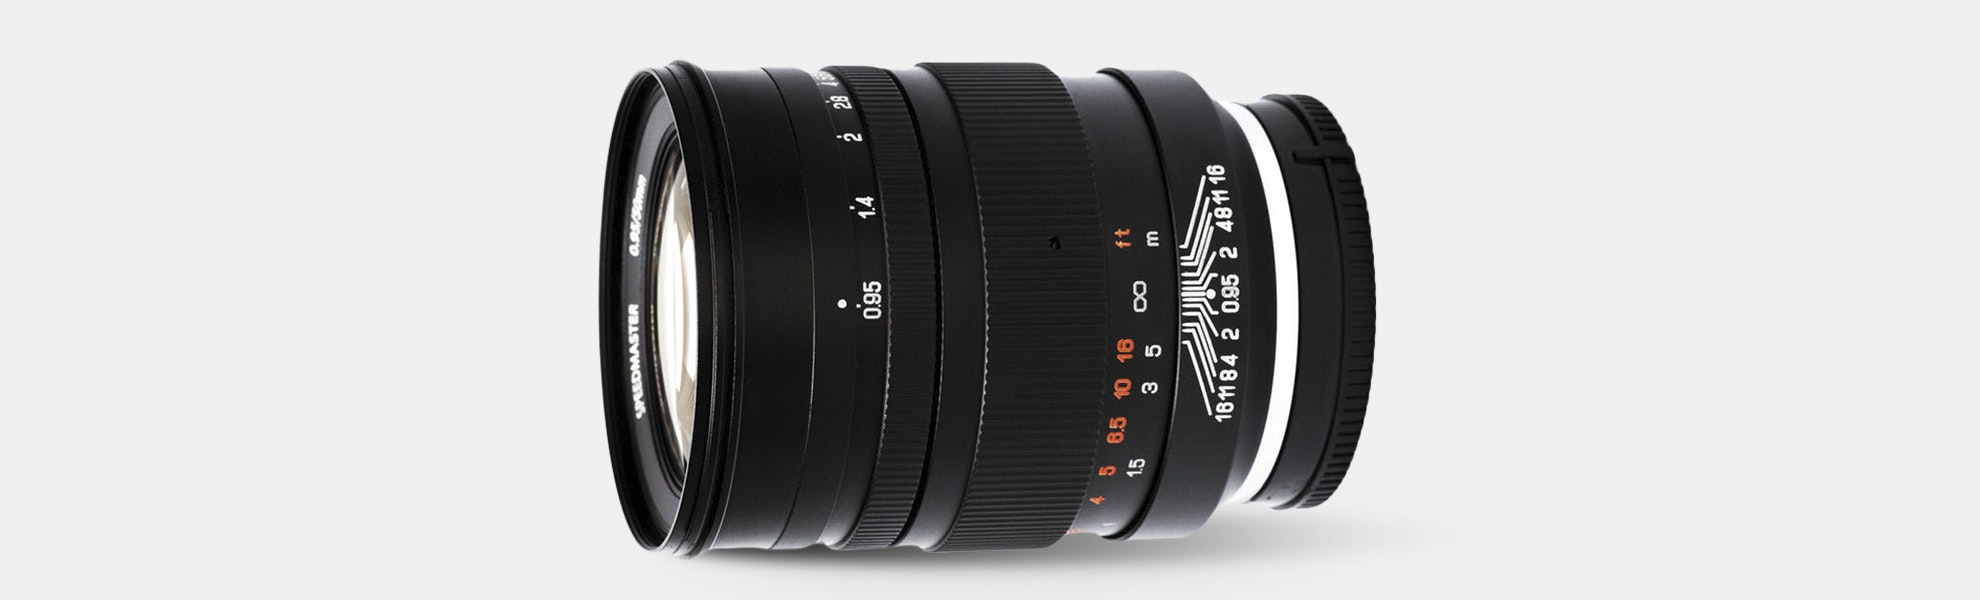 Mitakon Speedmaster 50mm f/0.95 Lens (Sony E)